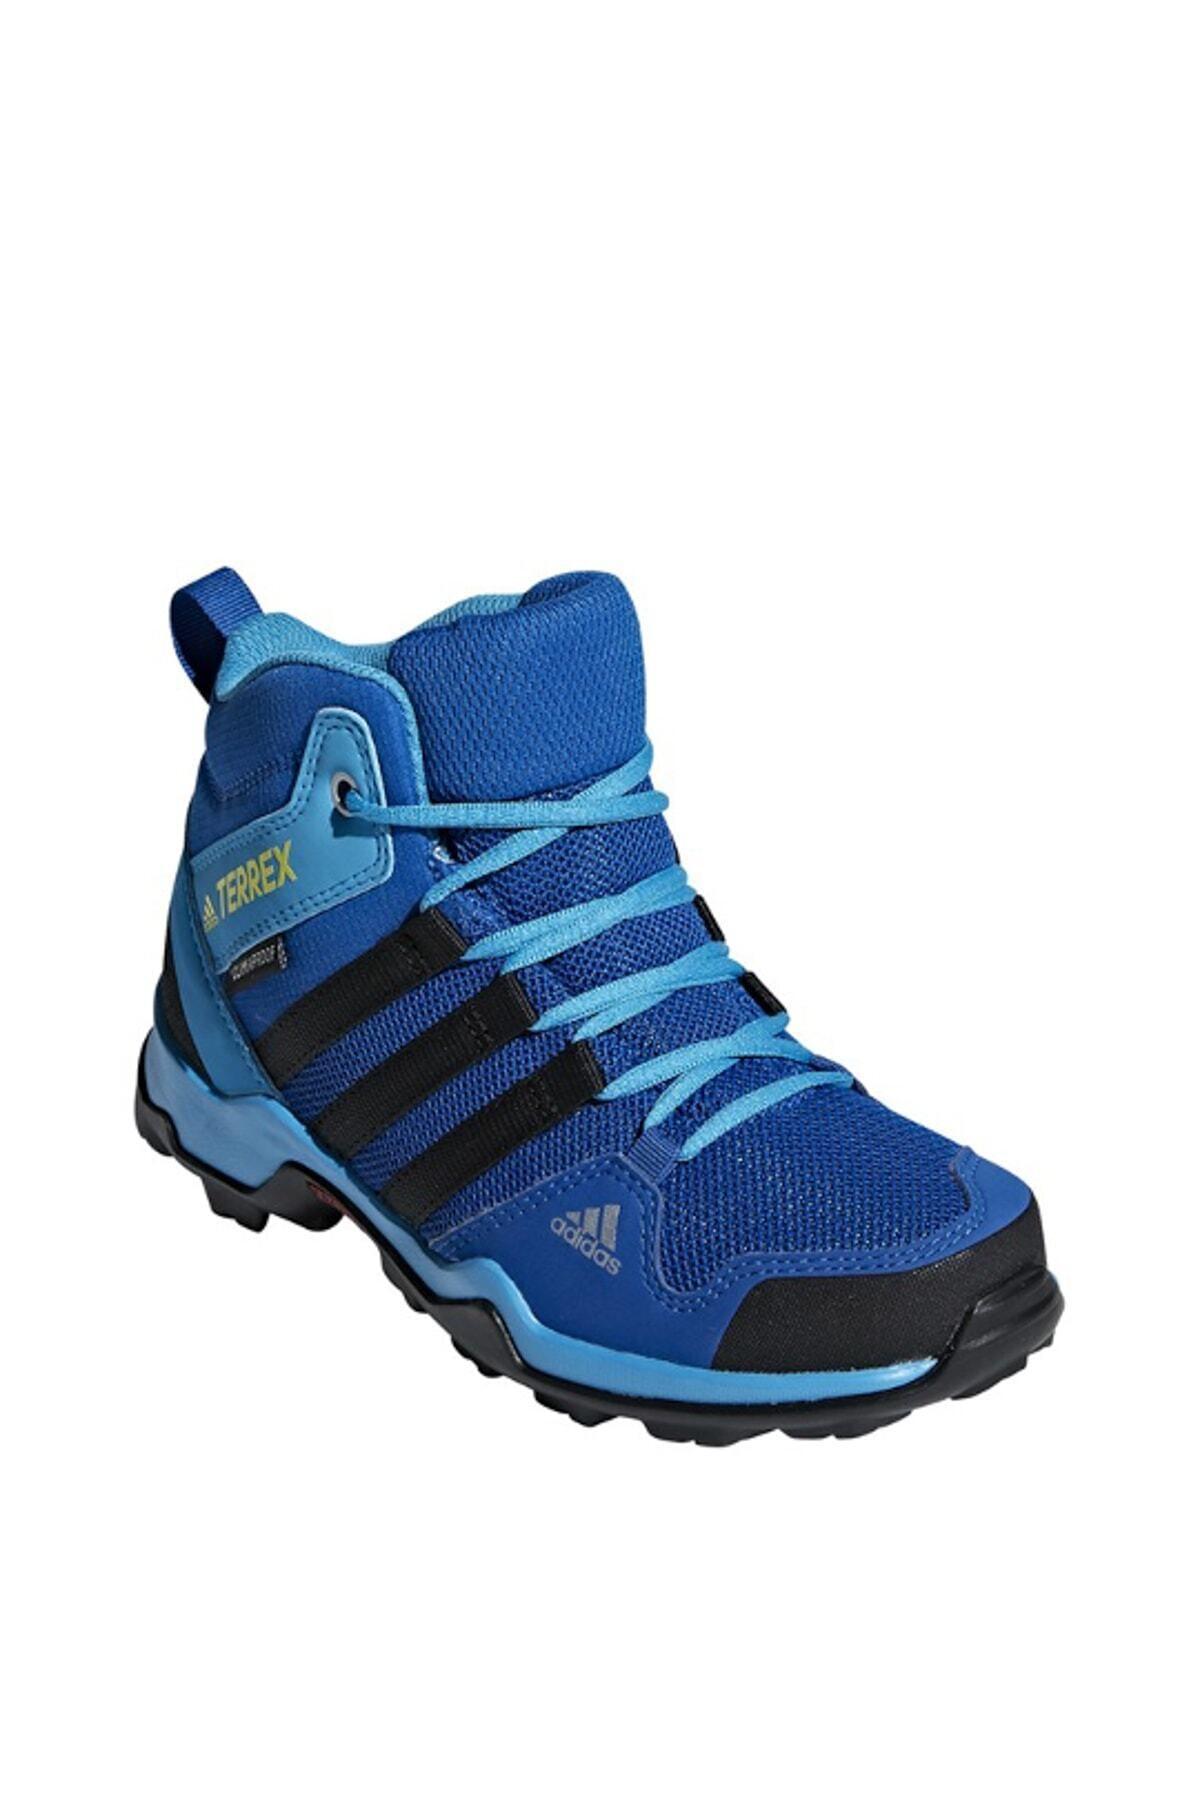 adidas Çocuk Outdoor Ayakkabı Terrex Ax2r Mid Cp K 2